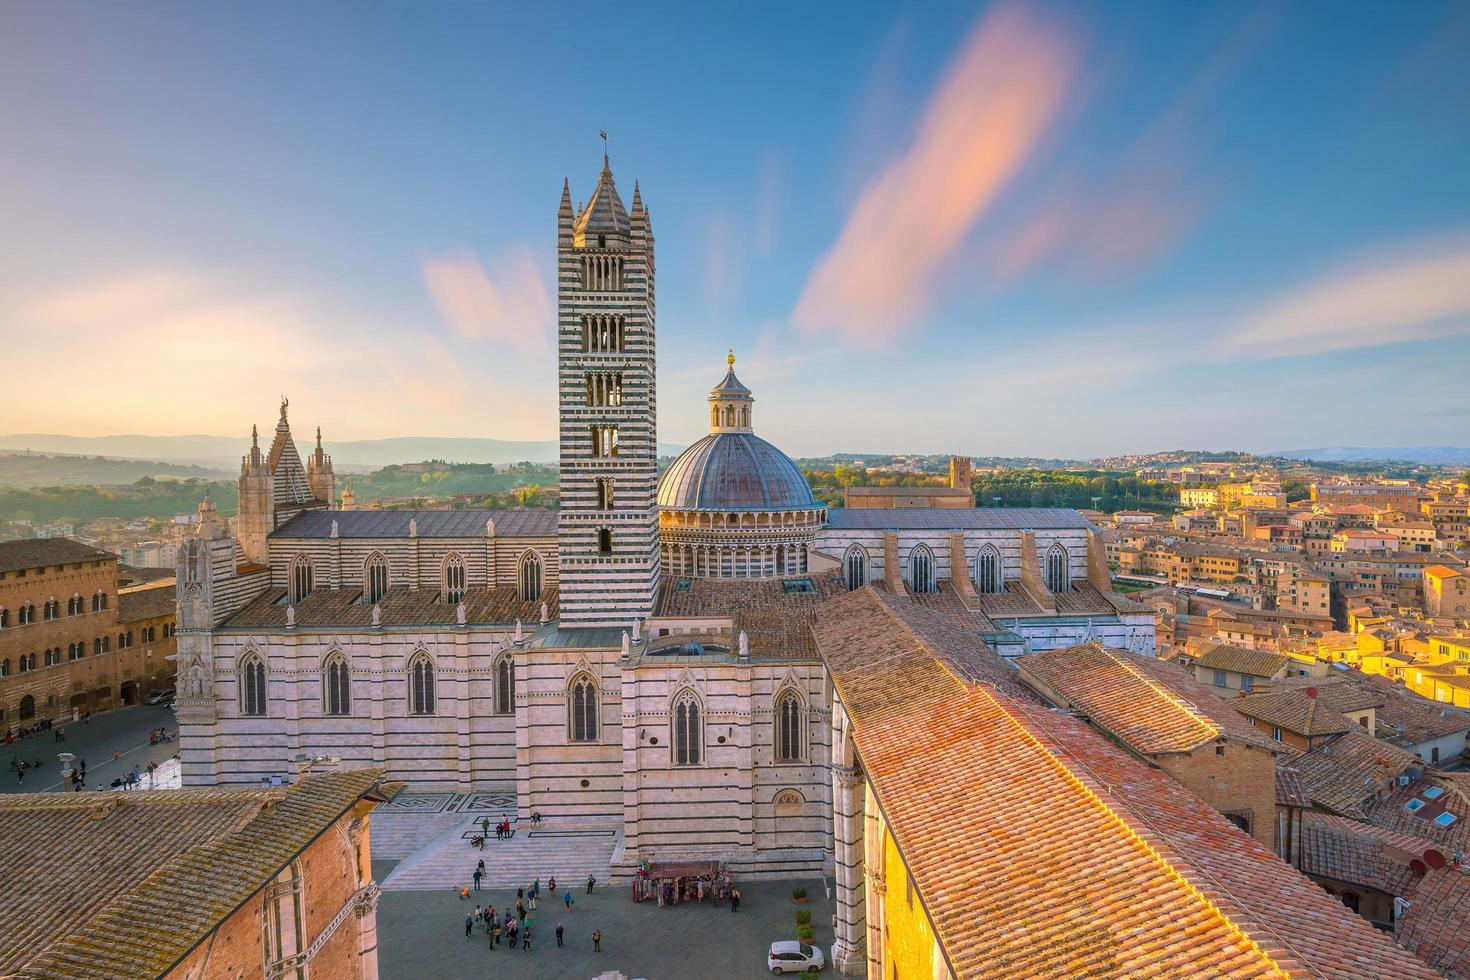 duomo di siena of grootstedelijke kathedraal van santa maria assunta in siena, italië. foto